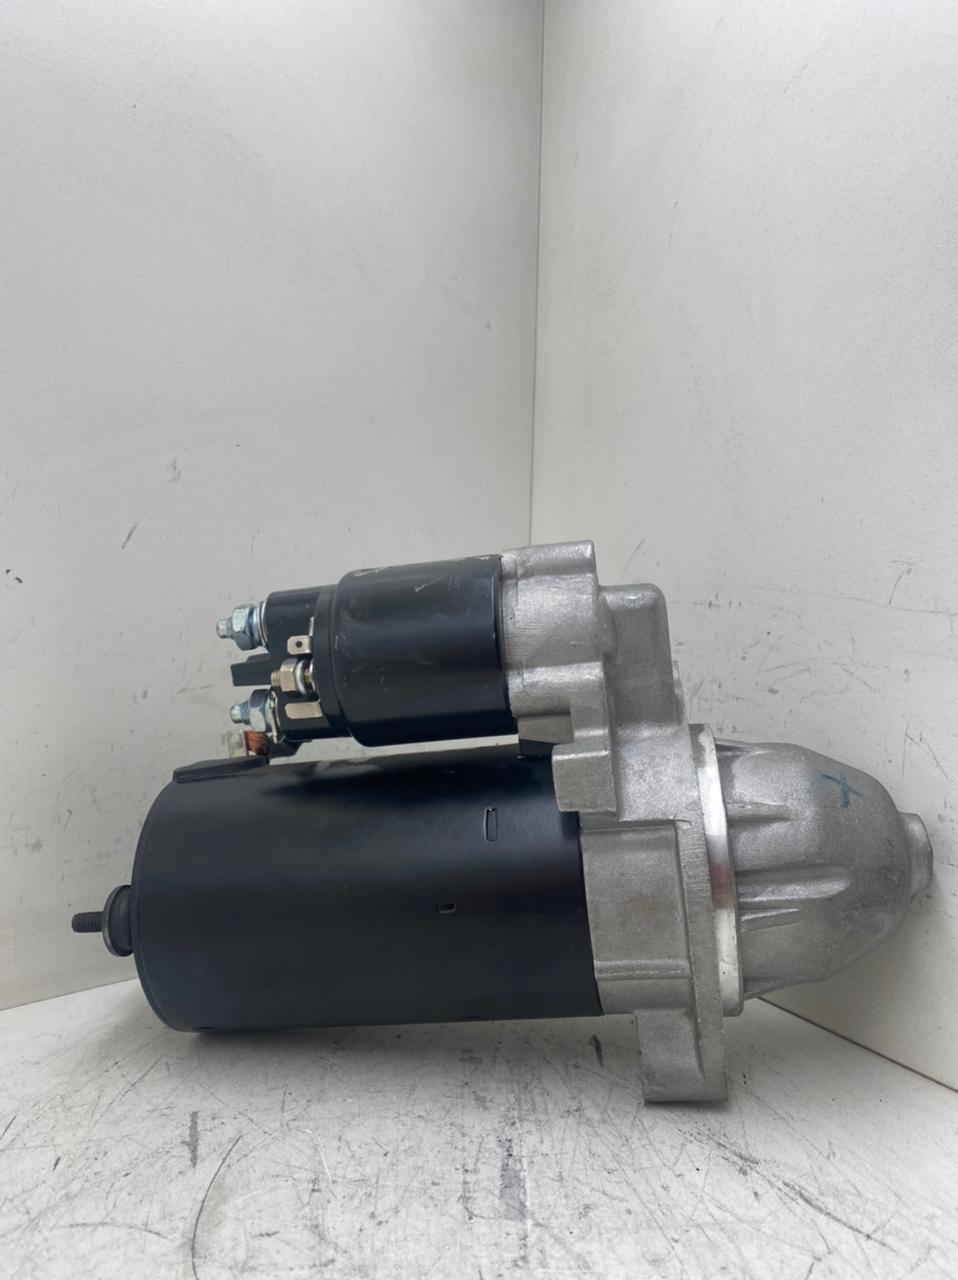 Motor de arranque MBB Sprinter 311 313 CDI accelo 715C OM612 BOSCH 12V 10 DENTES F042002065 0001109250 0001223005 0001223005 0051511301 A0051511301 D7R46 0001109014 E 20525 D 20181 SL S0137 AEC14011